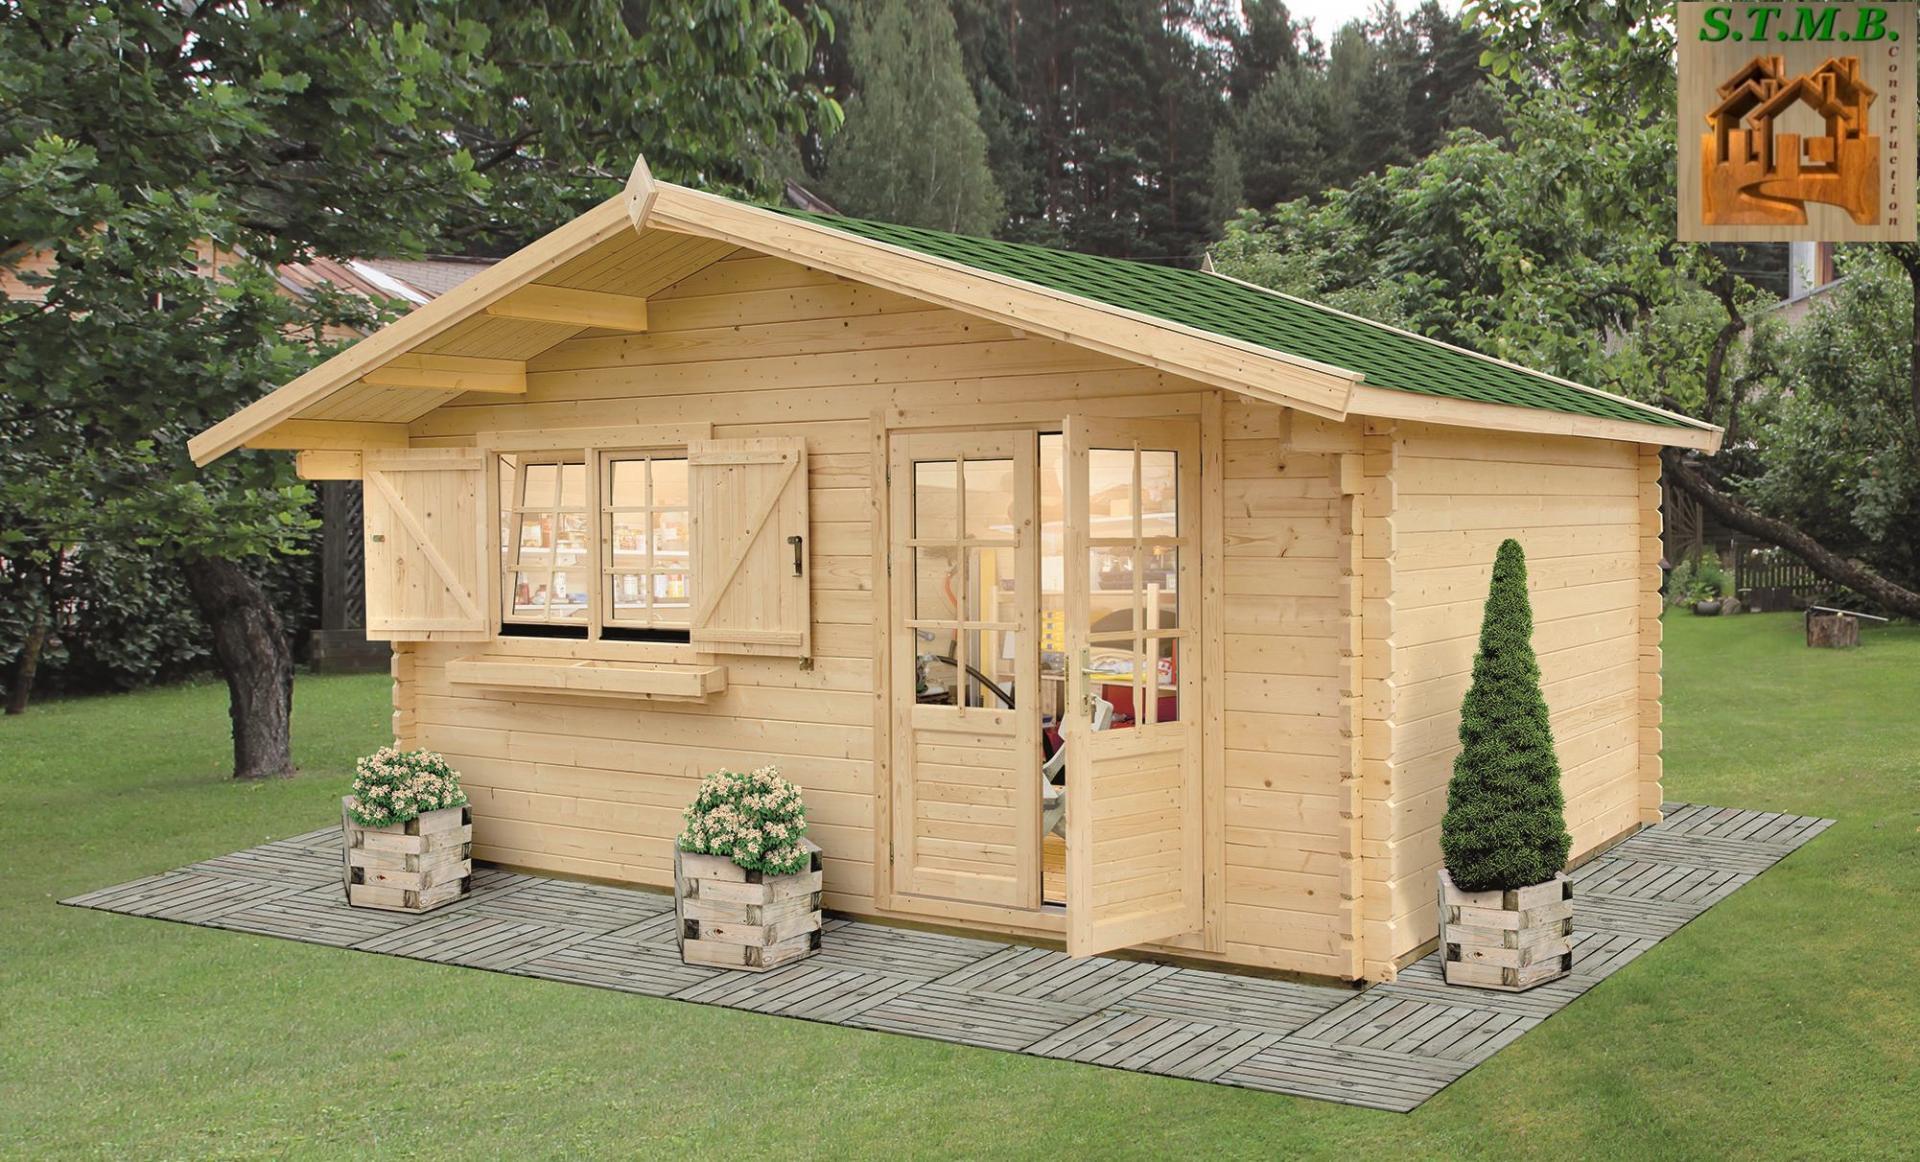 Maison de jardin en bois  stmbconstructionchaletsboiscom